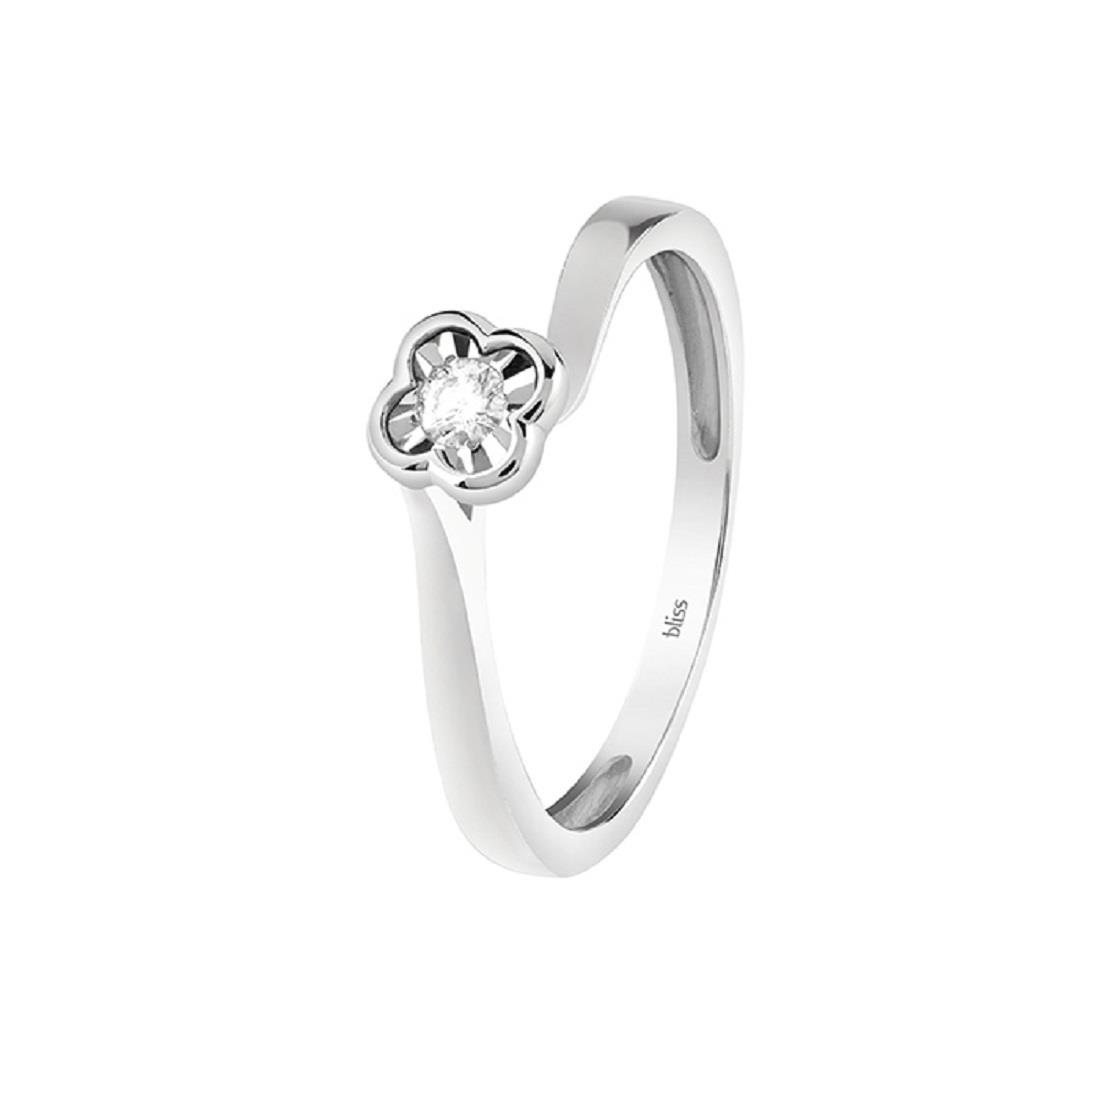 Anello con diamante - BLISS